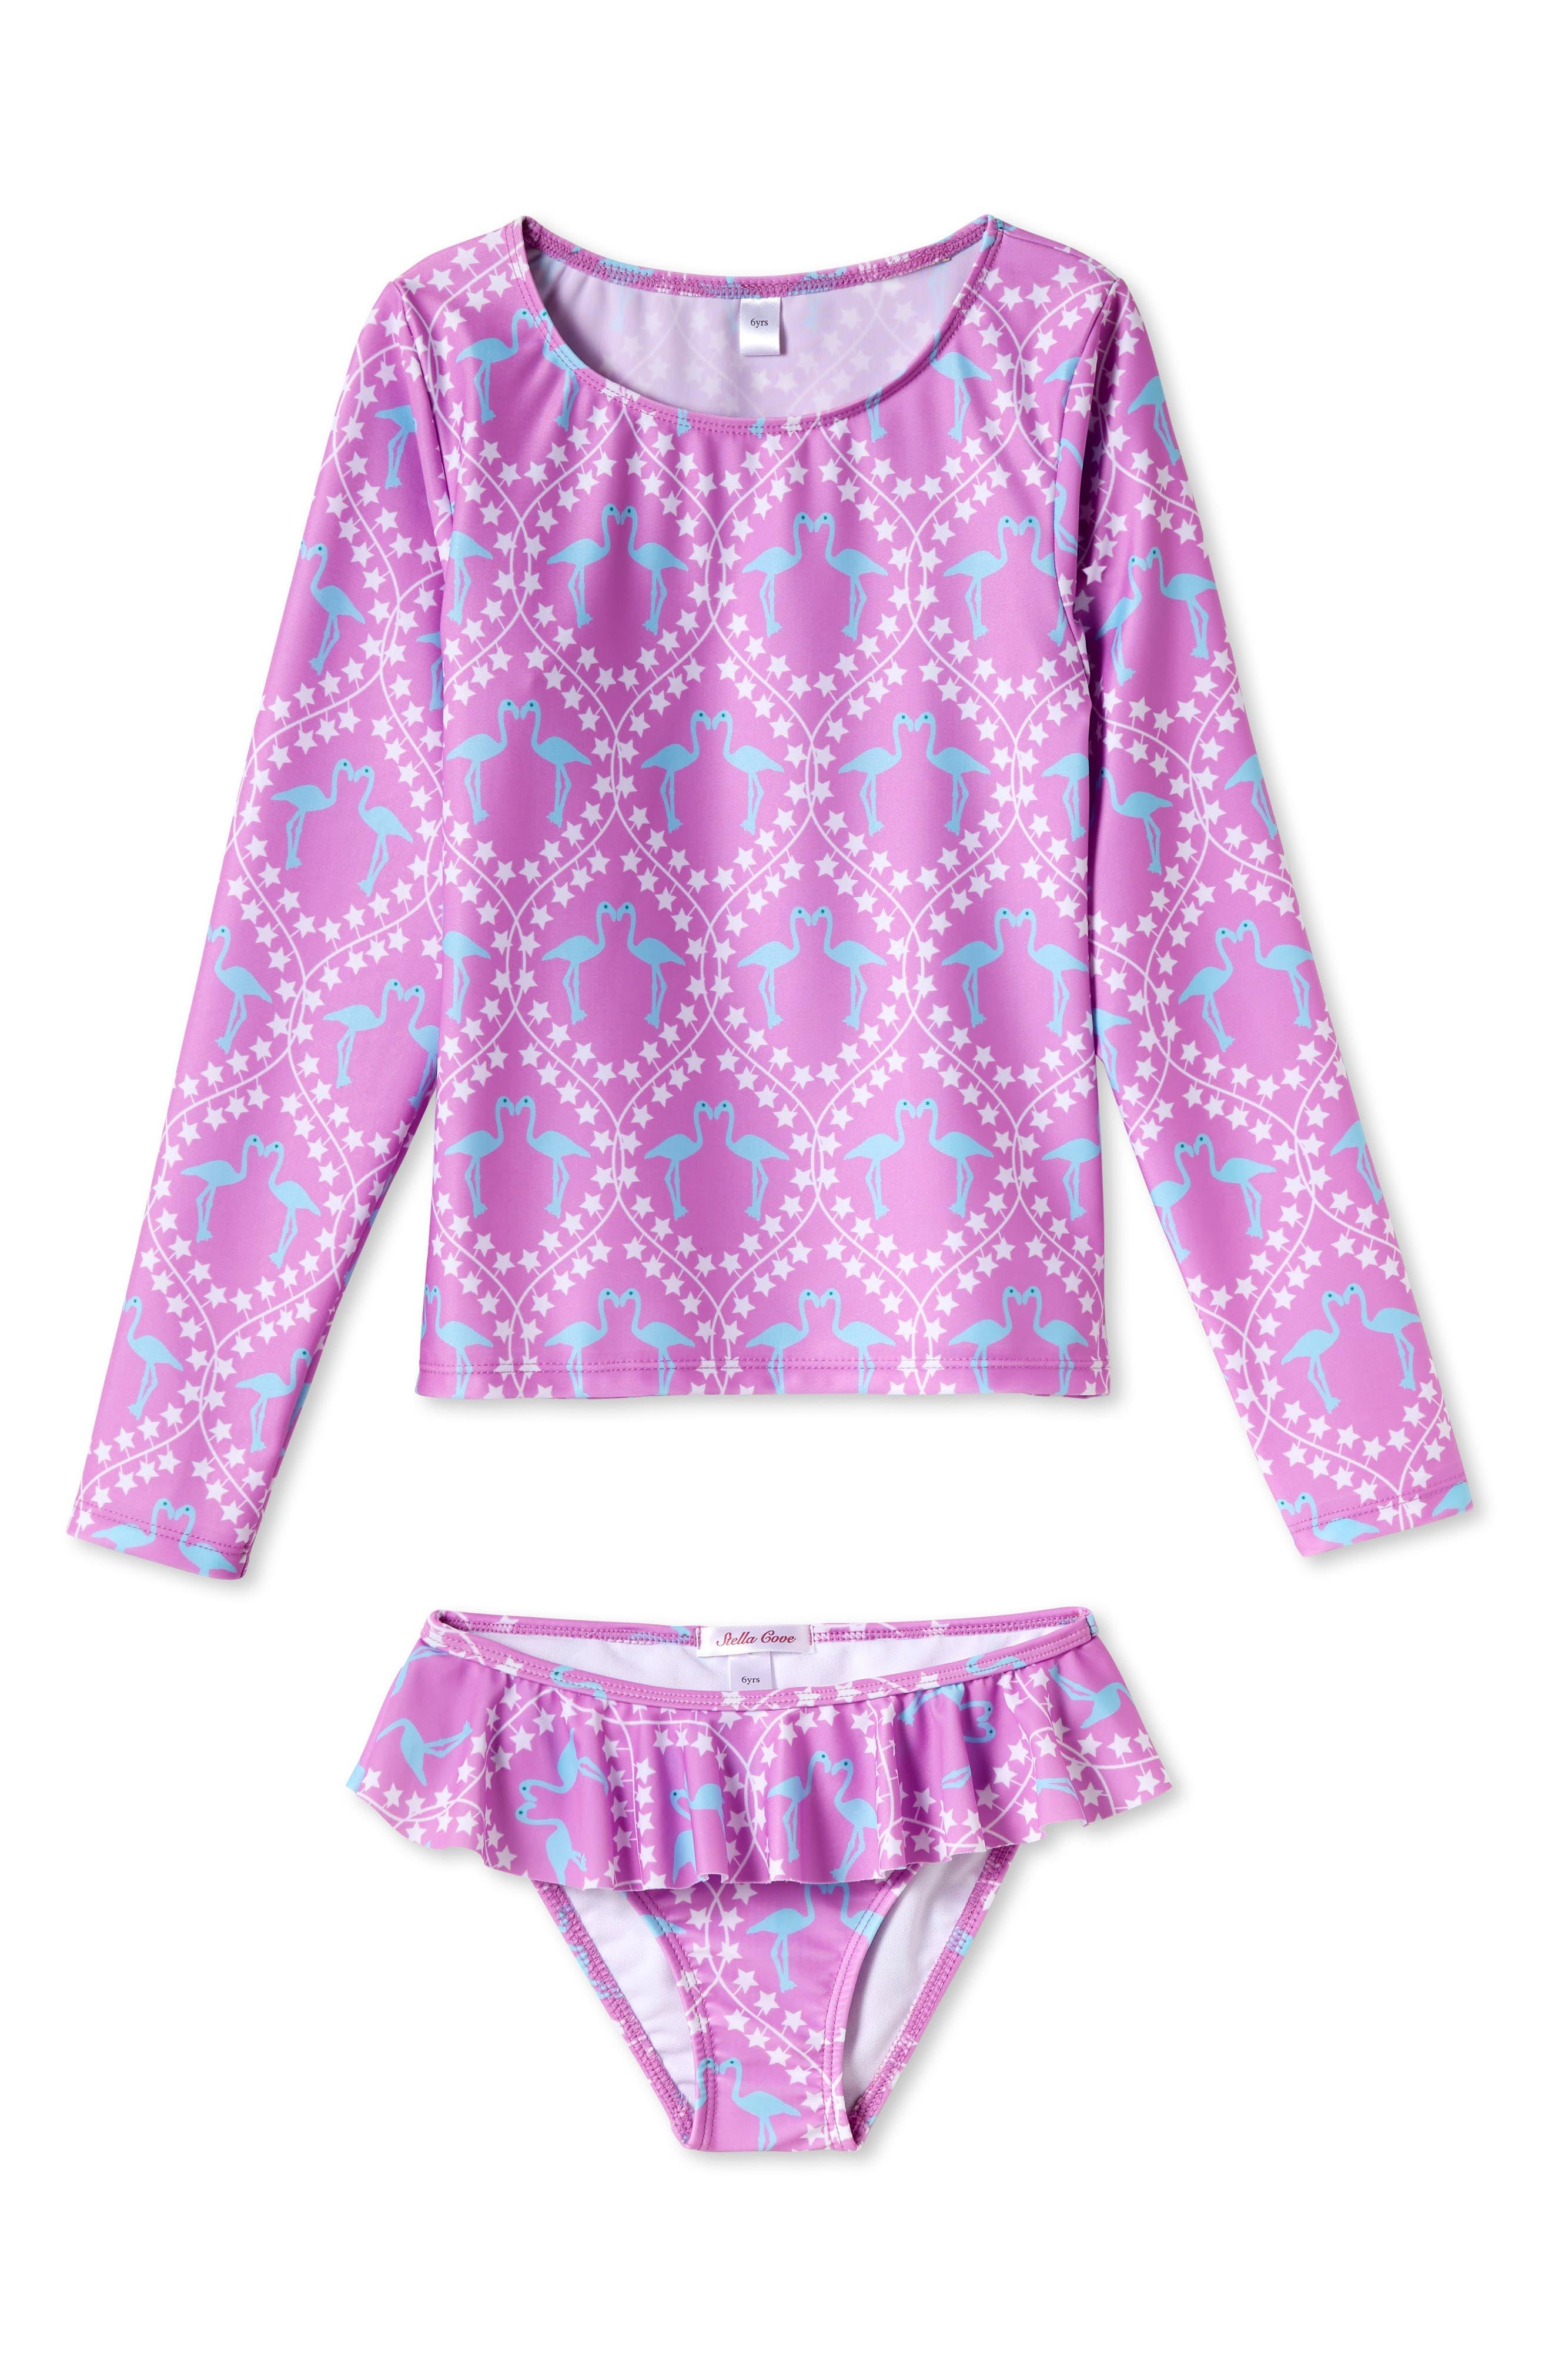 ee57cfa7eae Girl's Stella Cove Flamingo Print Two-Piece Rashguard Swimsuit, Pink